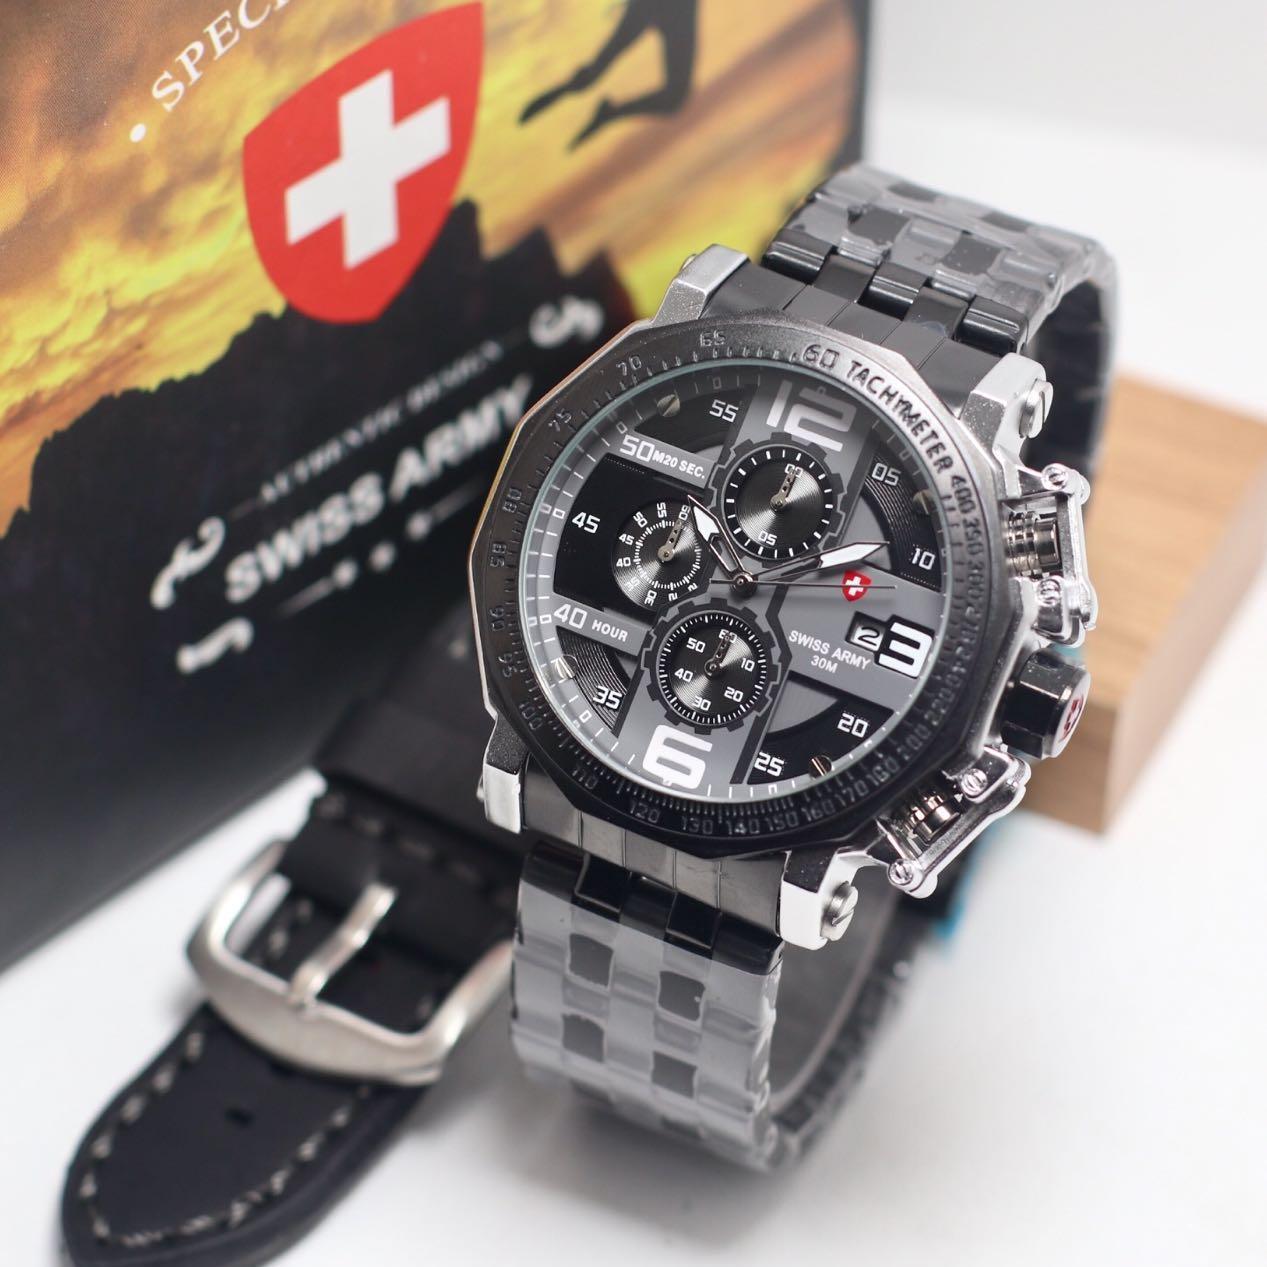 Swiss Army Original Crono Jam Tangan Pria Tali Kulit4 Daftar Harga Analog Kotak Series Kulit Coklat